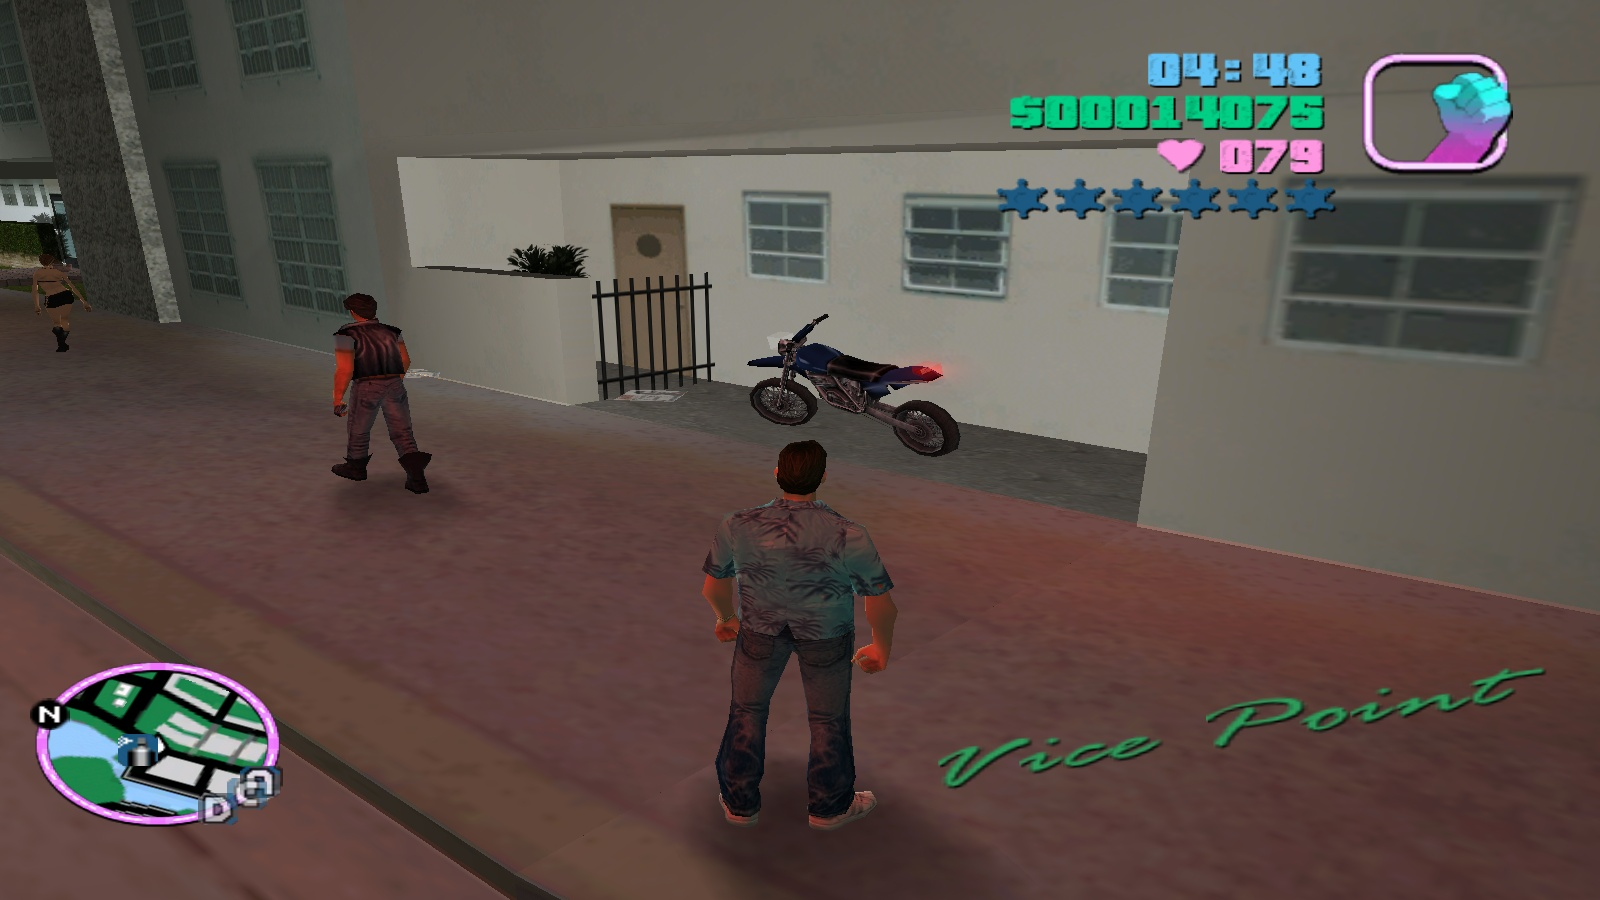 3 - Grand Theft Auto: Vice City